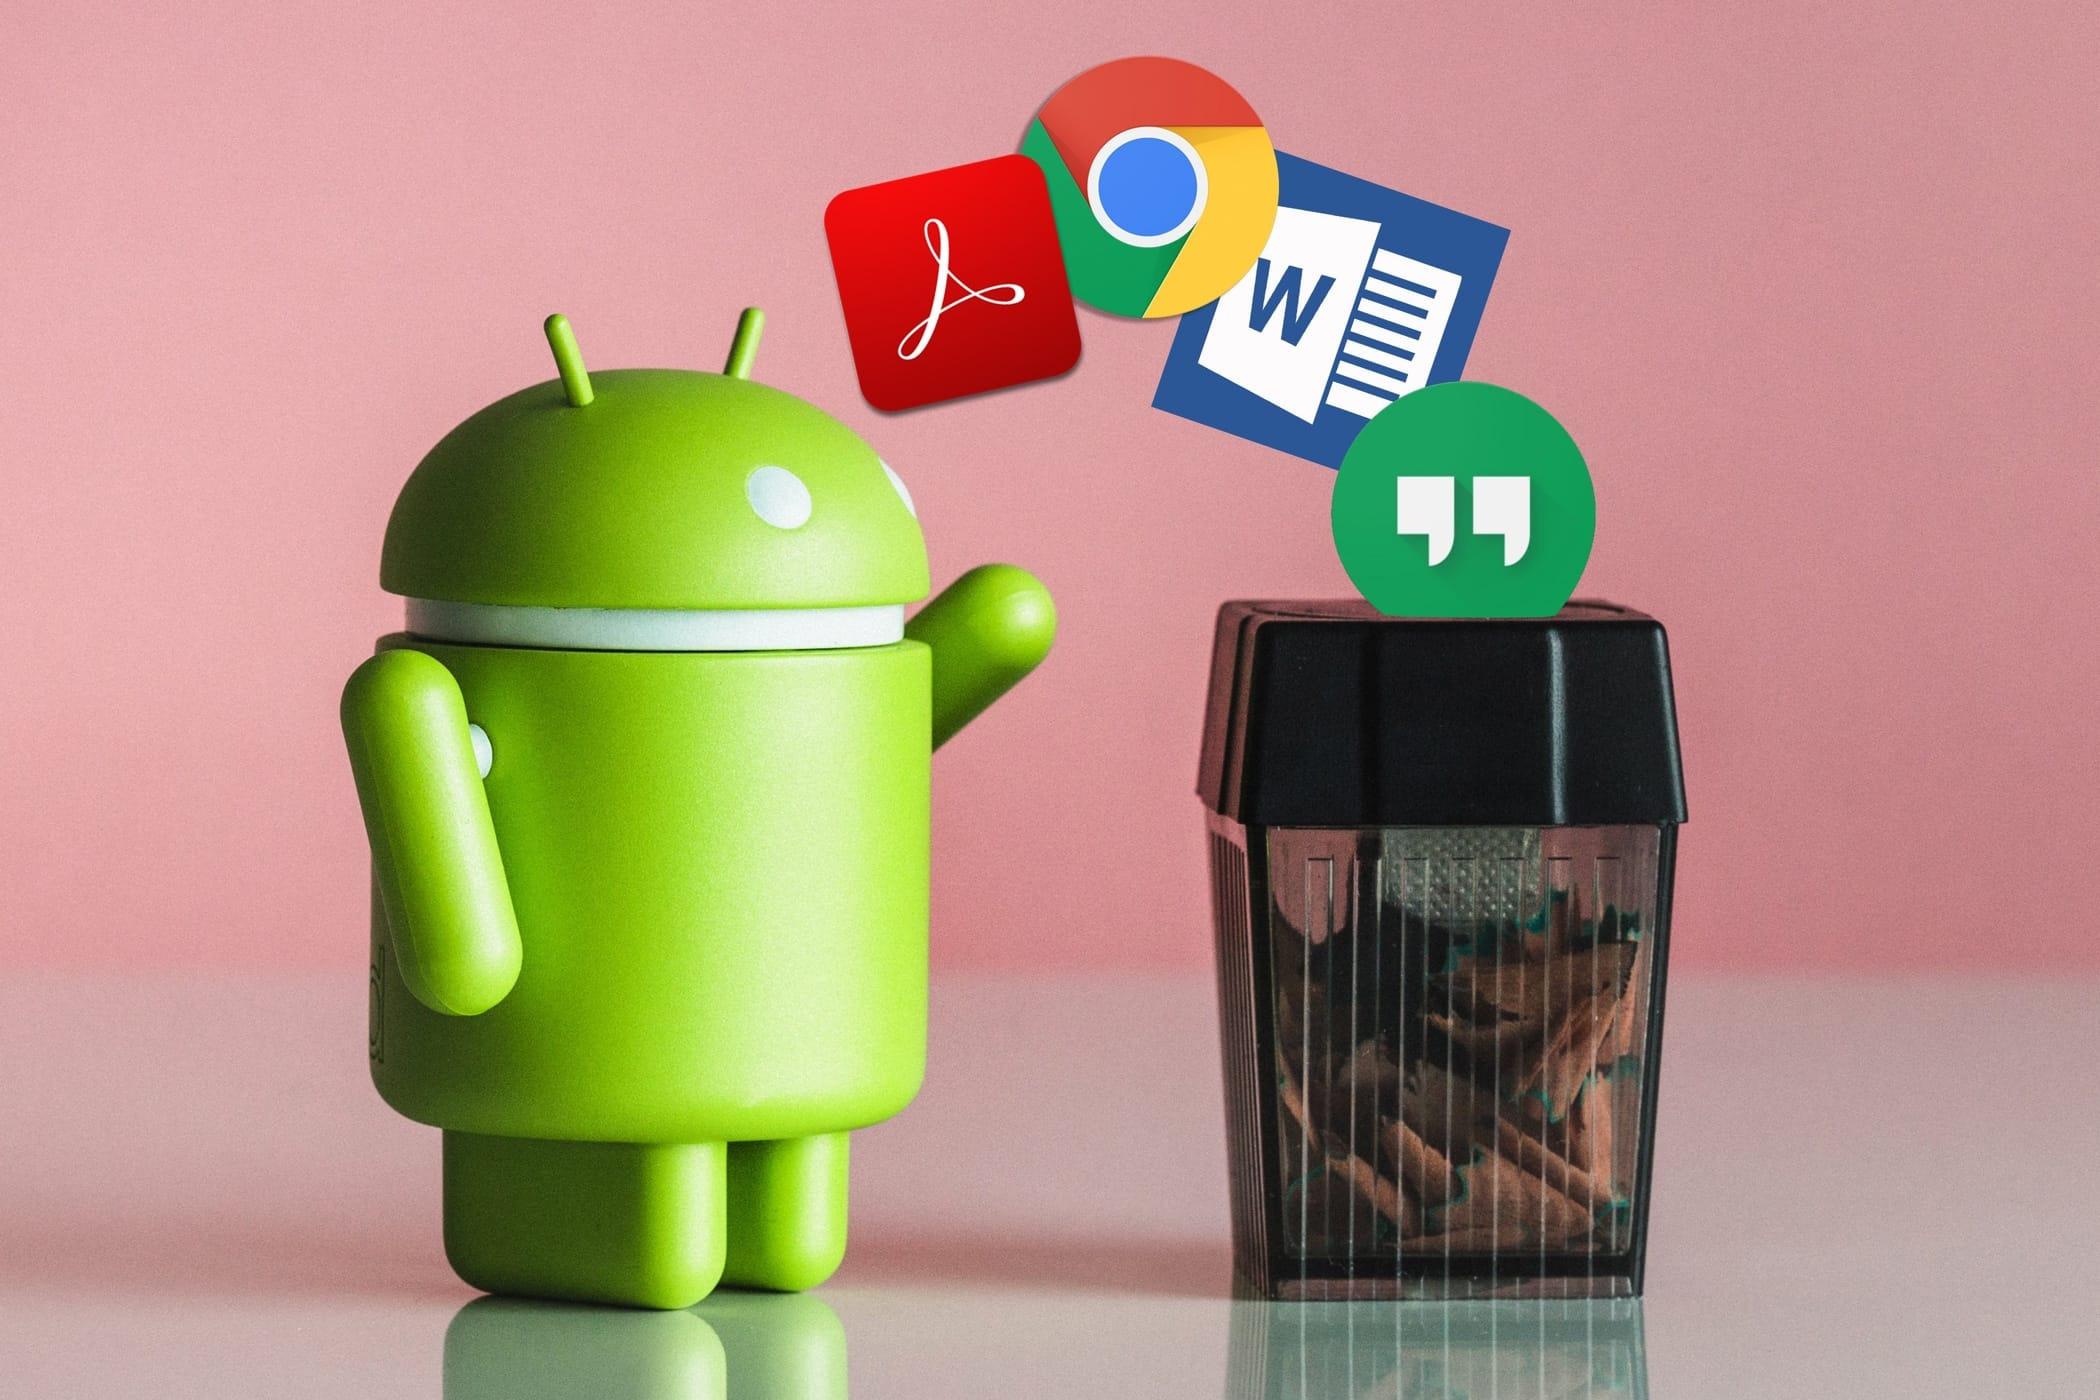 Удаление файлов на Андроиде